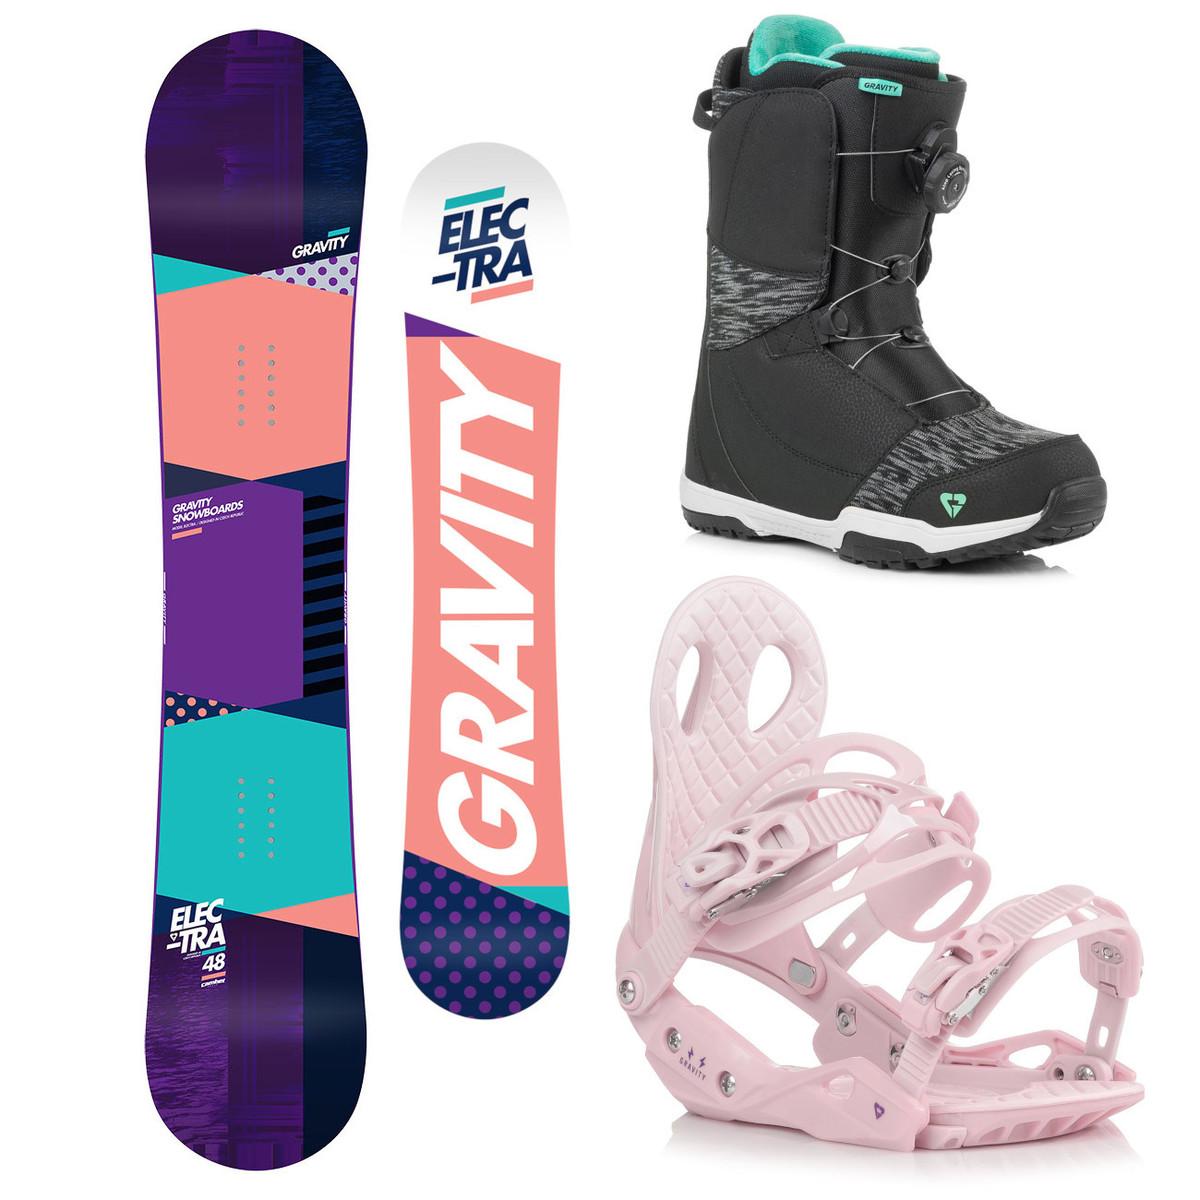 Snowboardový komplet Gravity Electra 18/19 M (EU 37-42) 144 Růžová